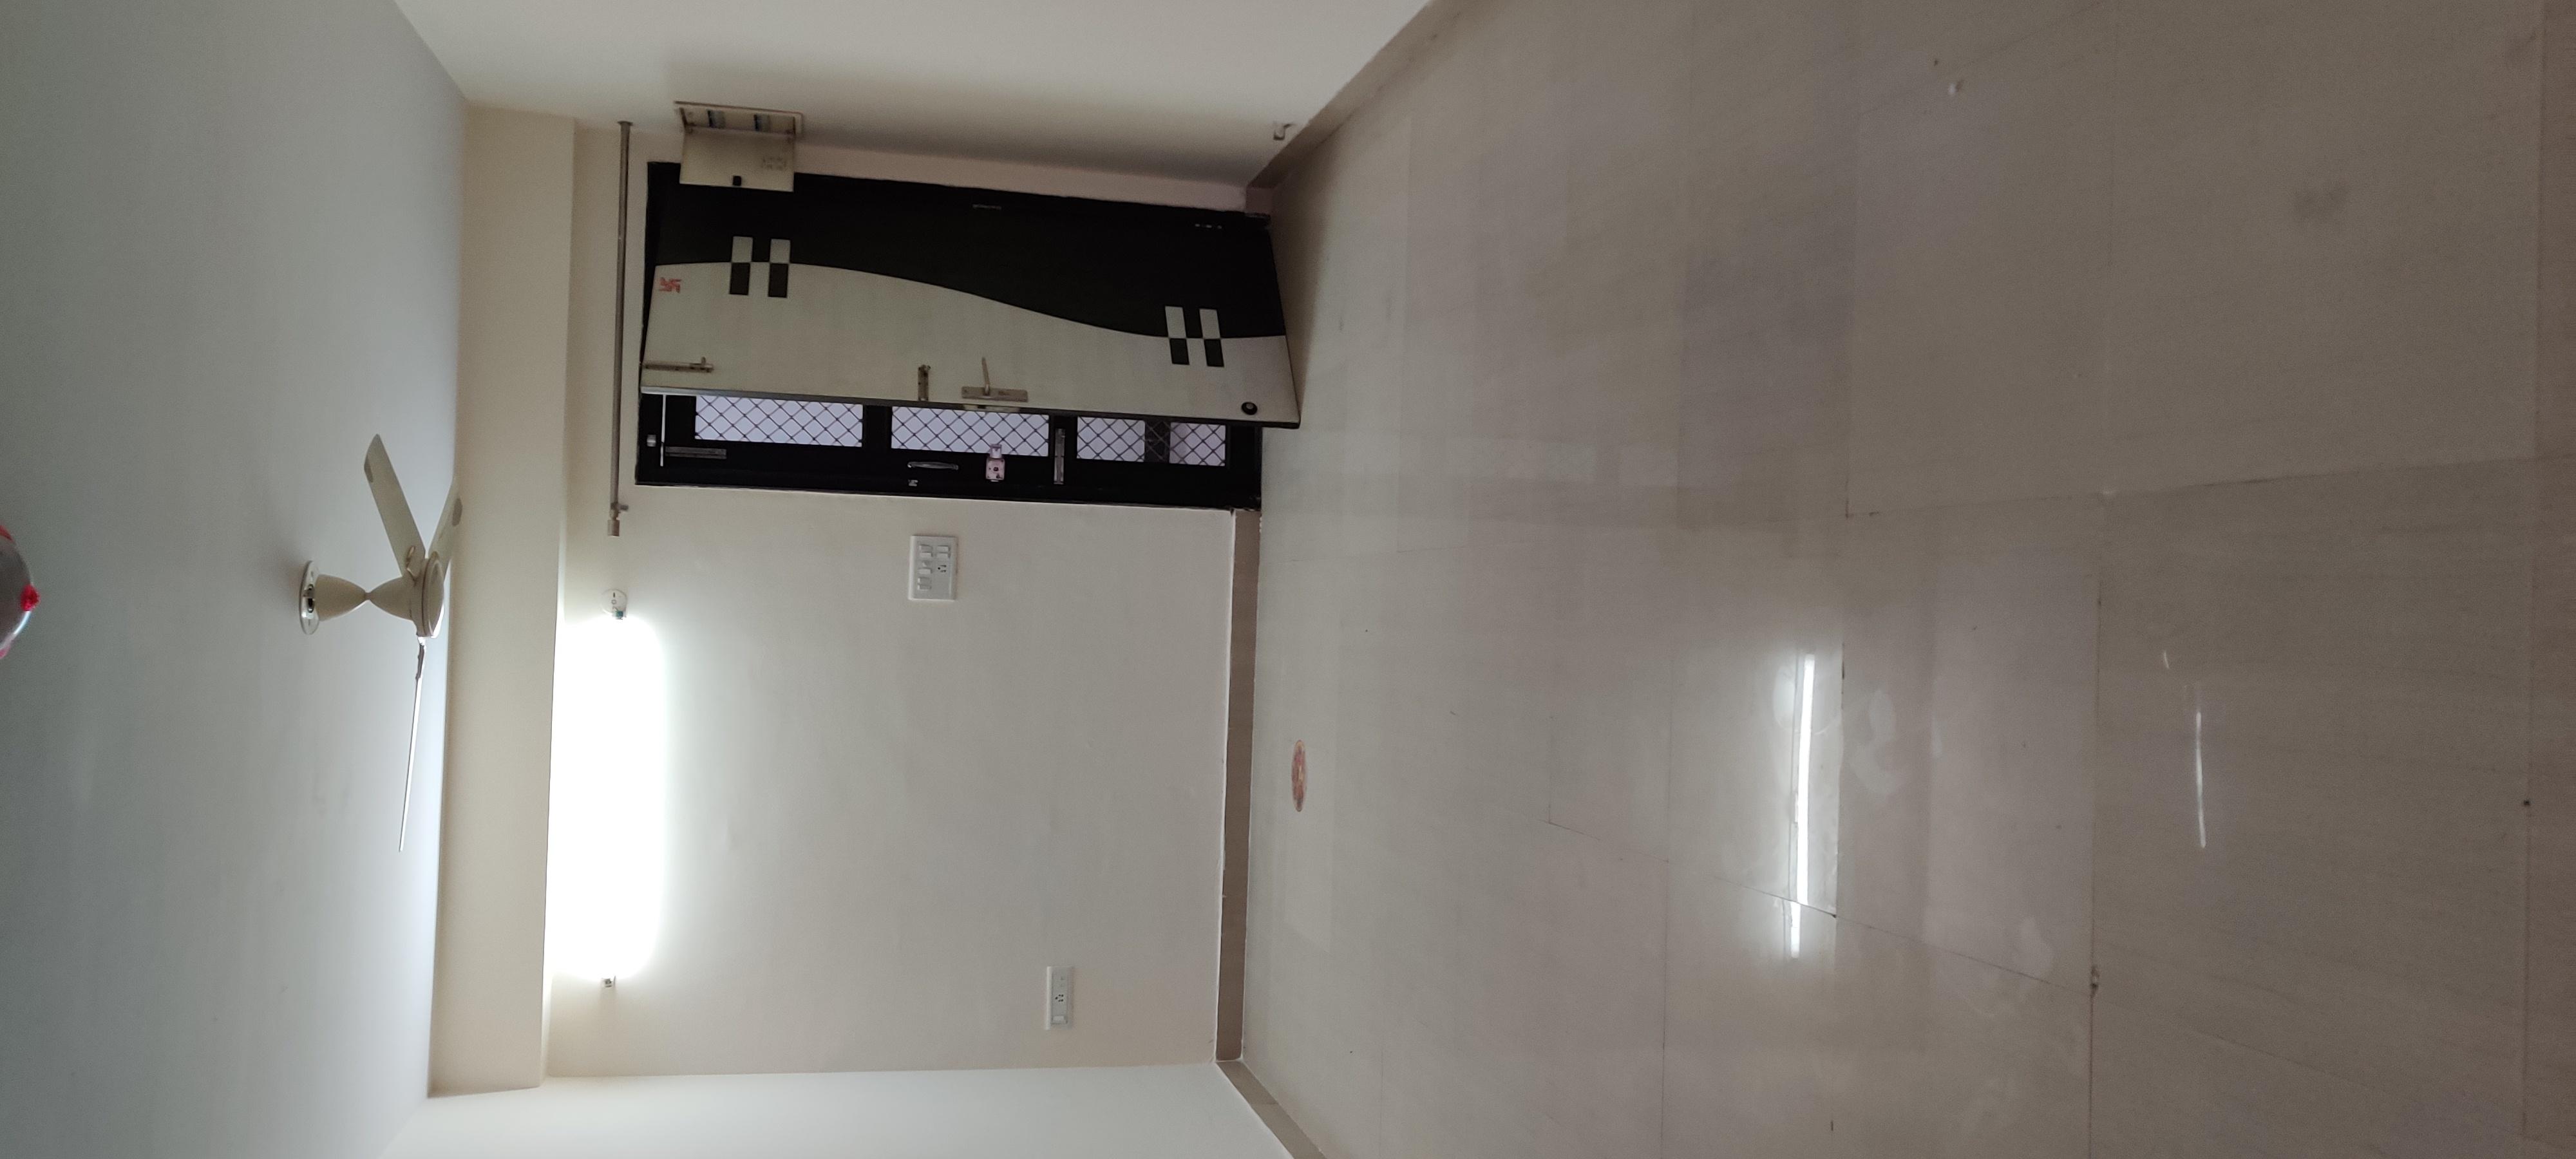 2 BHK + Extra Room  Apartment For Rent in Mansarovar